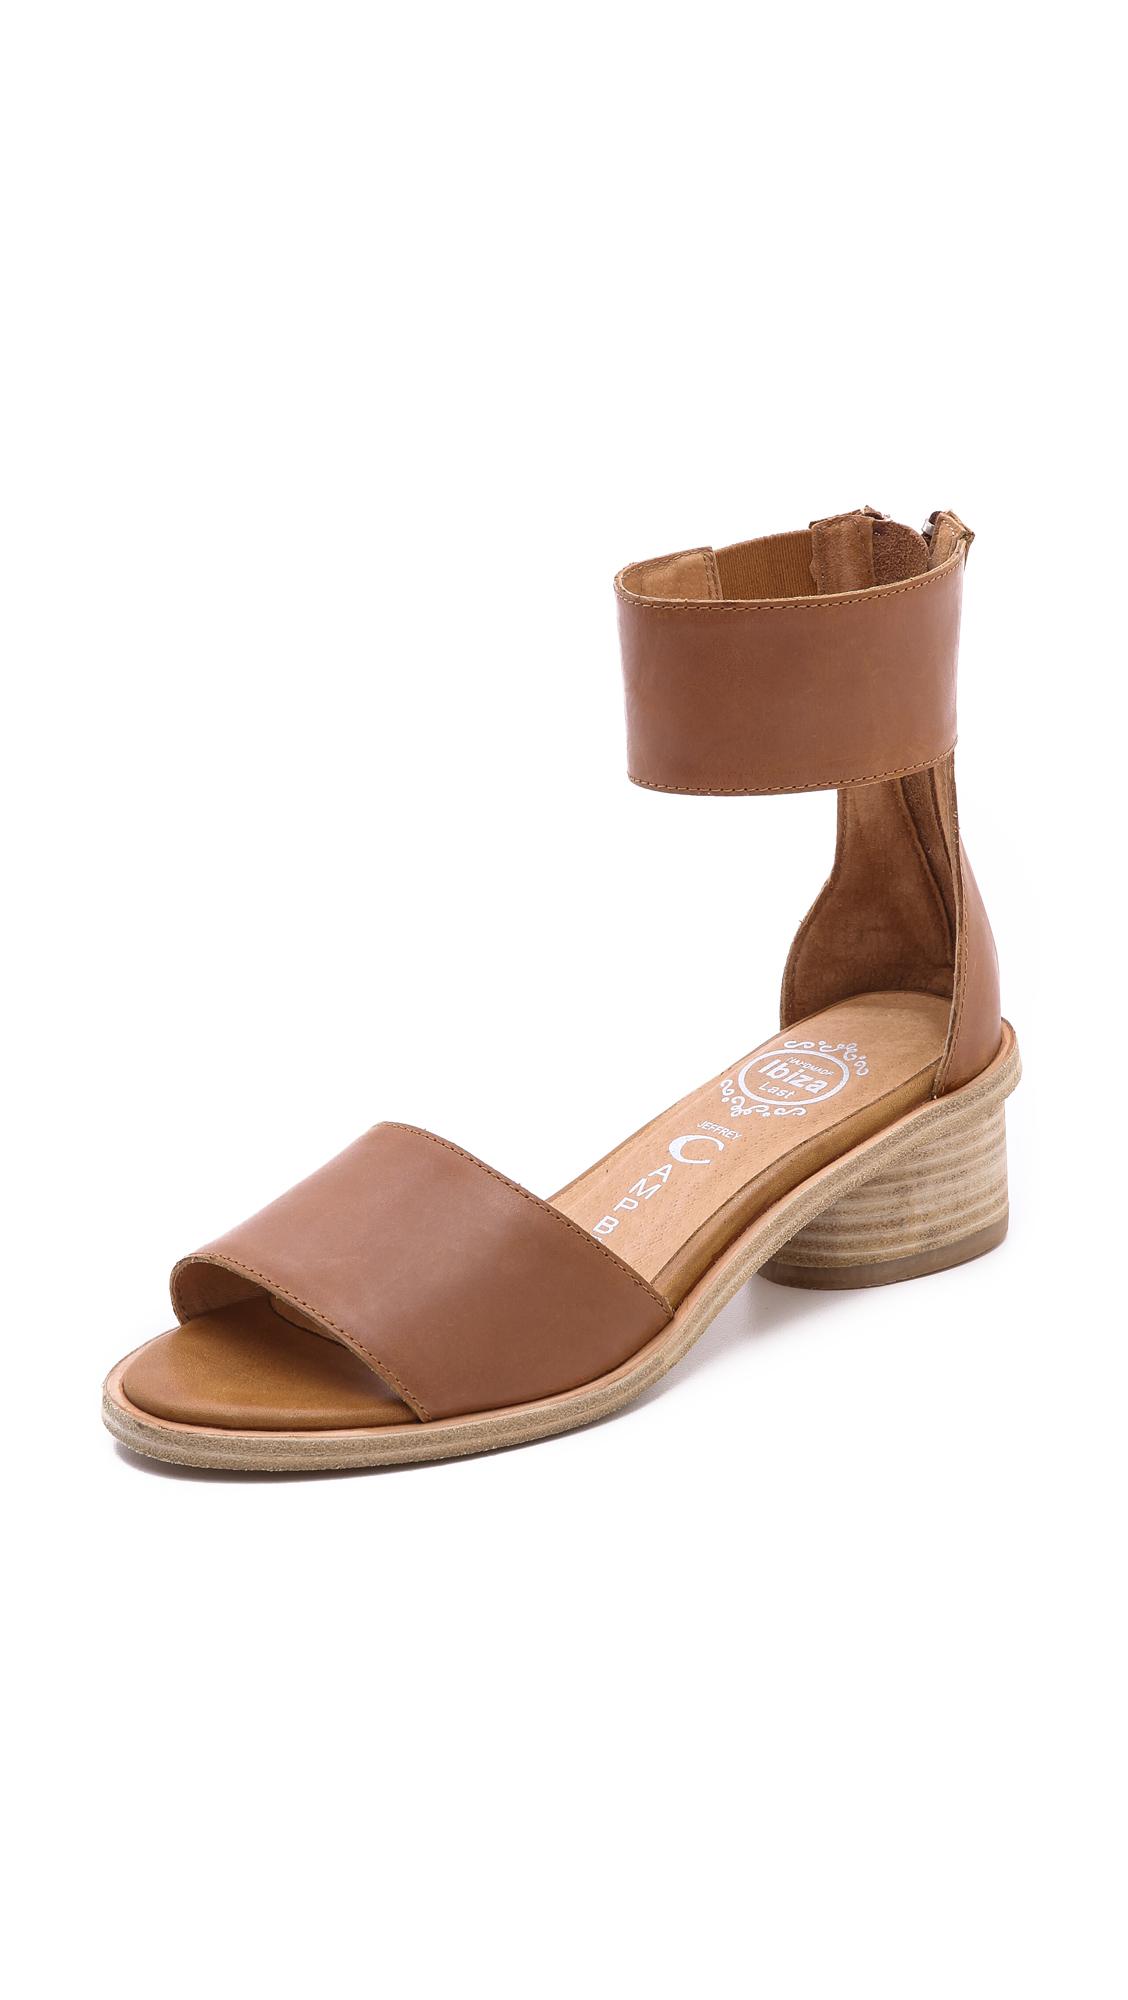 Jeffrey Campbell Borgia Low Heel Sandals In Brown Tan Lyst